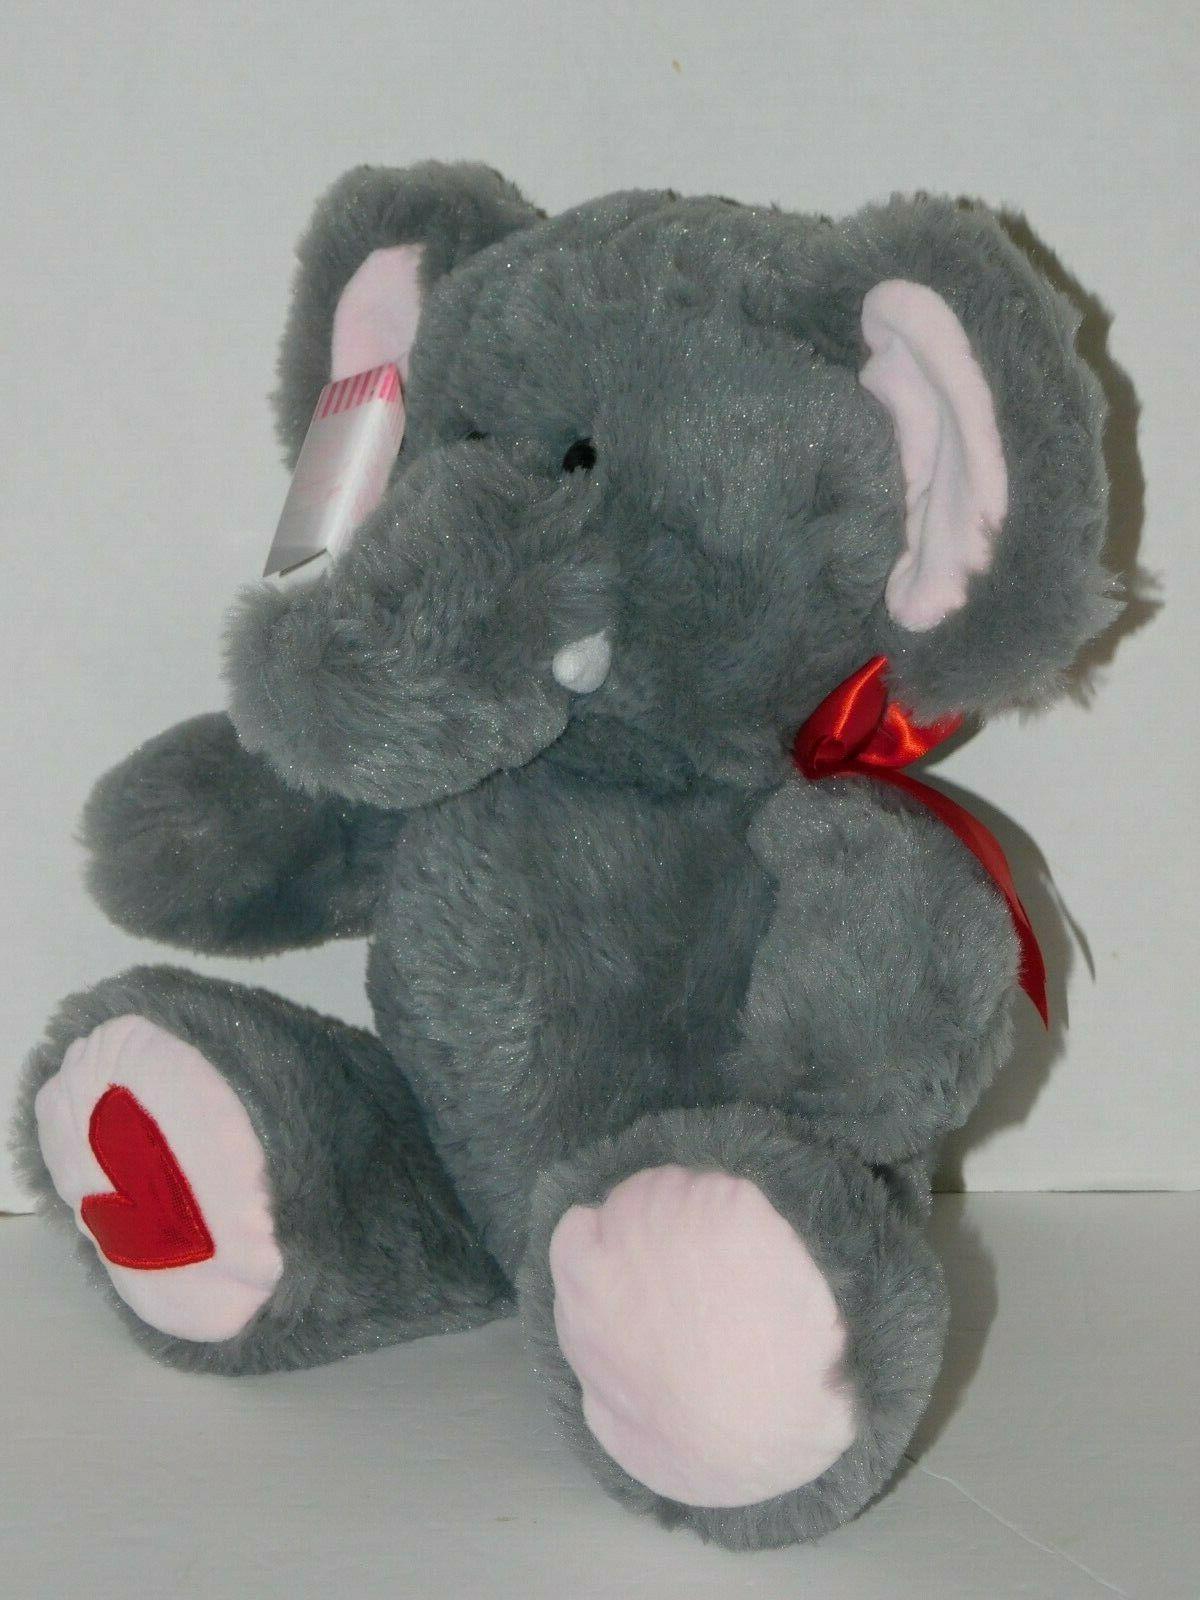 elephant plush stuffed animal 10 5 inch